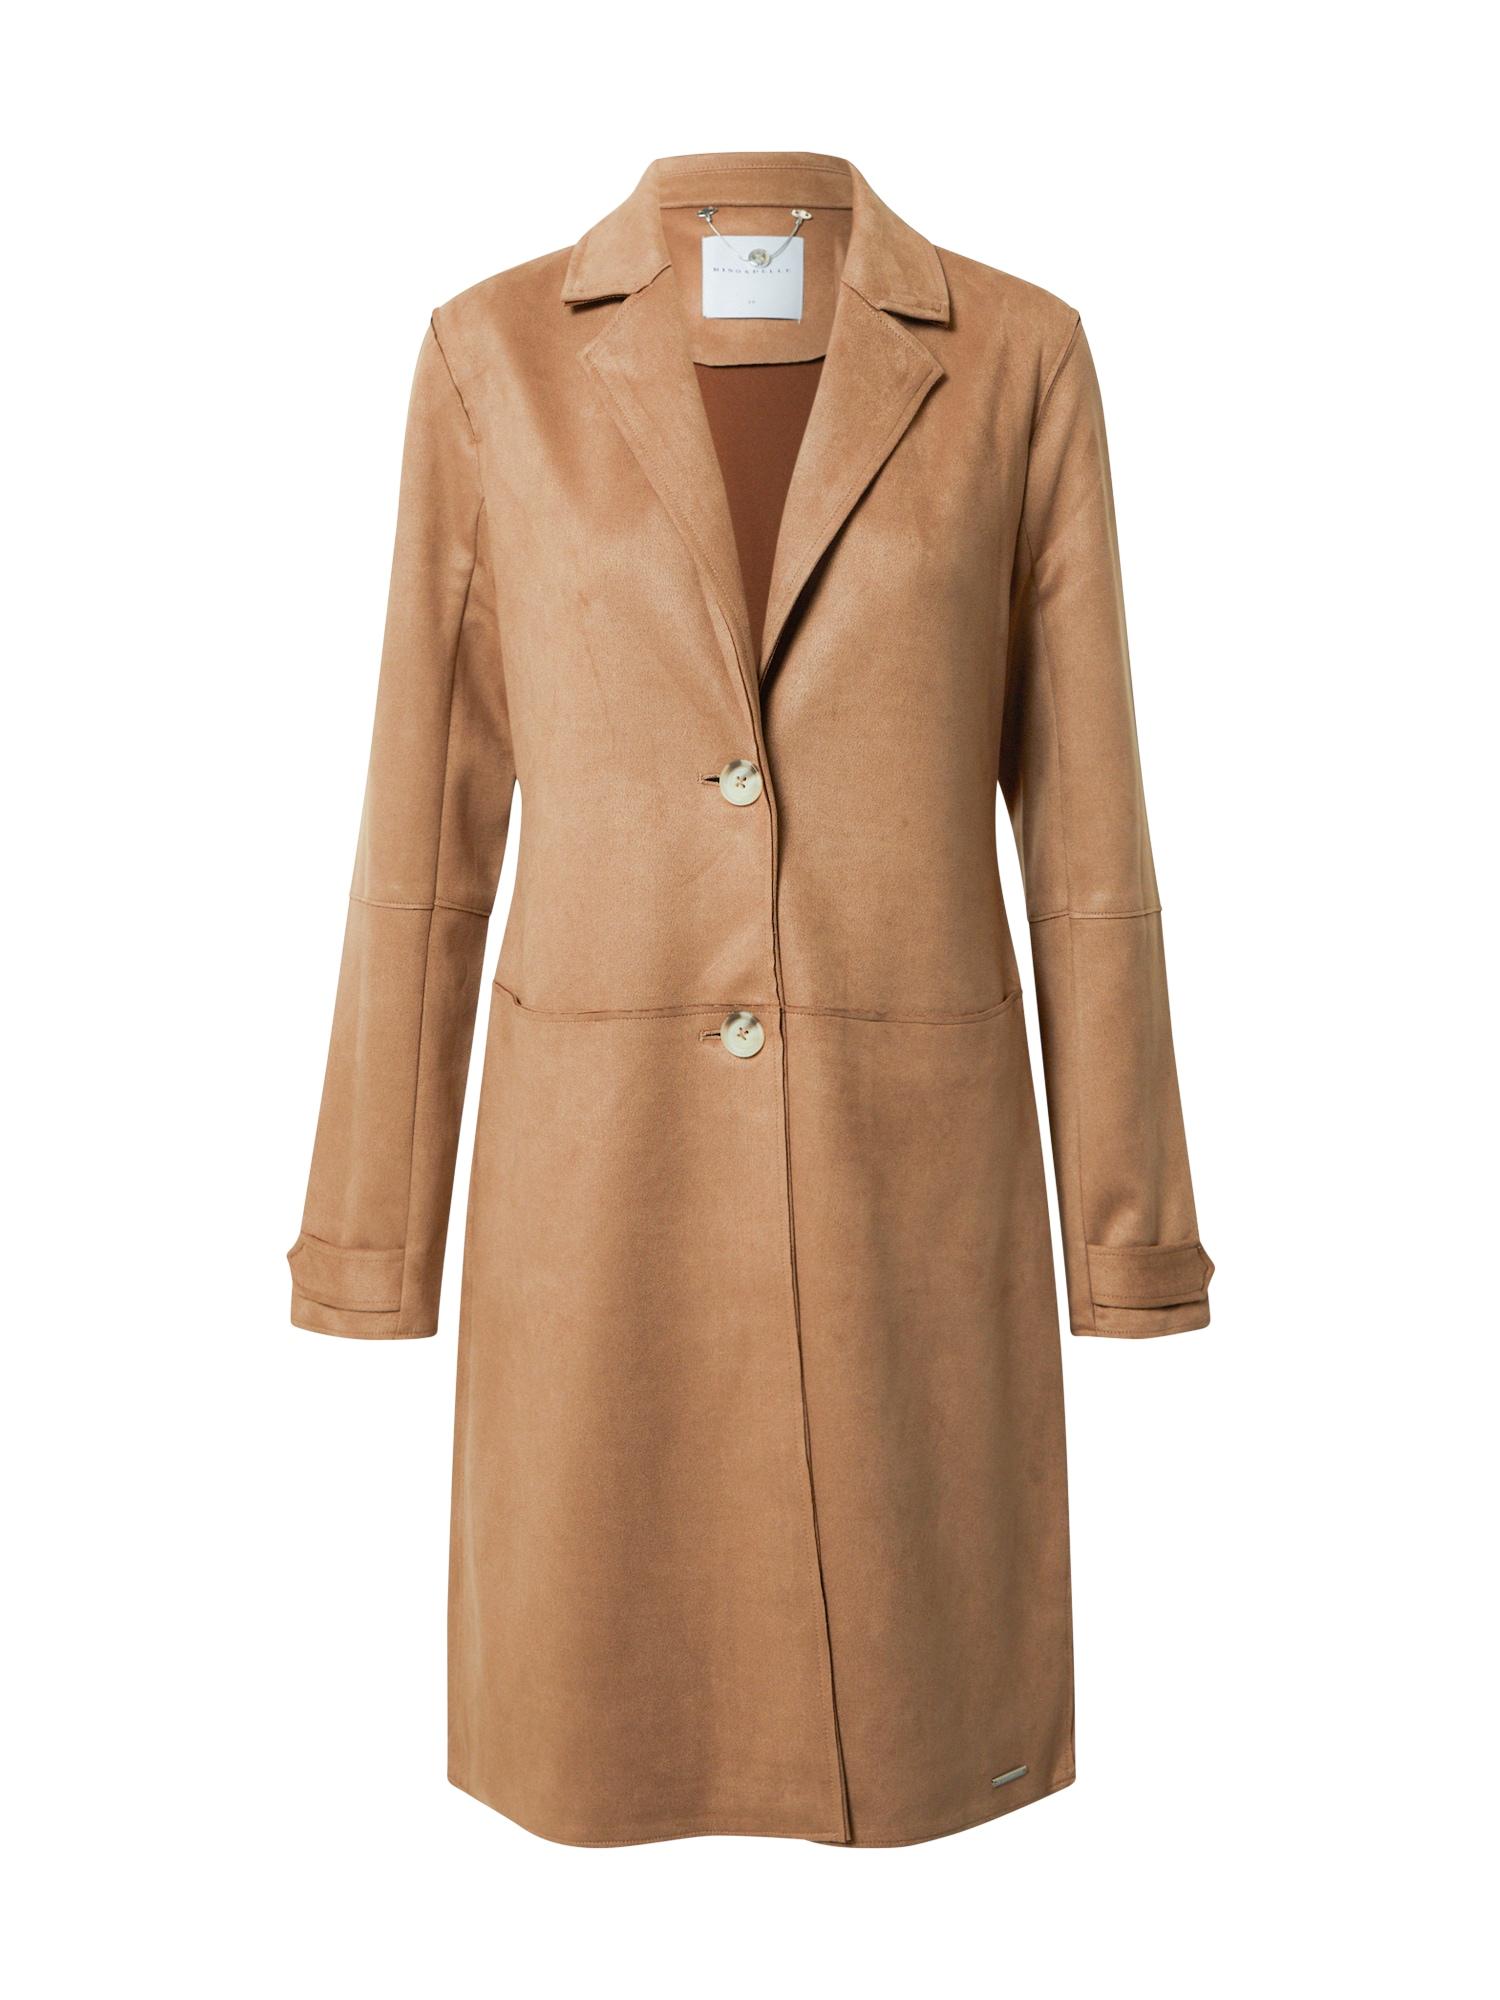 RINO & PELLE Demisezoninis paltas ruda (konjako)